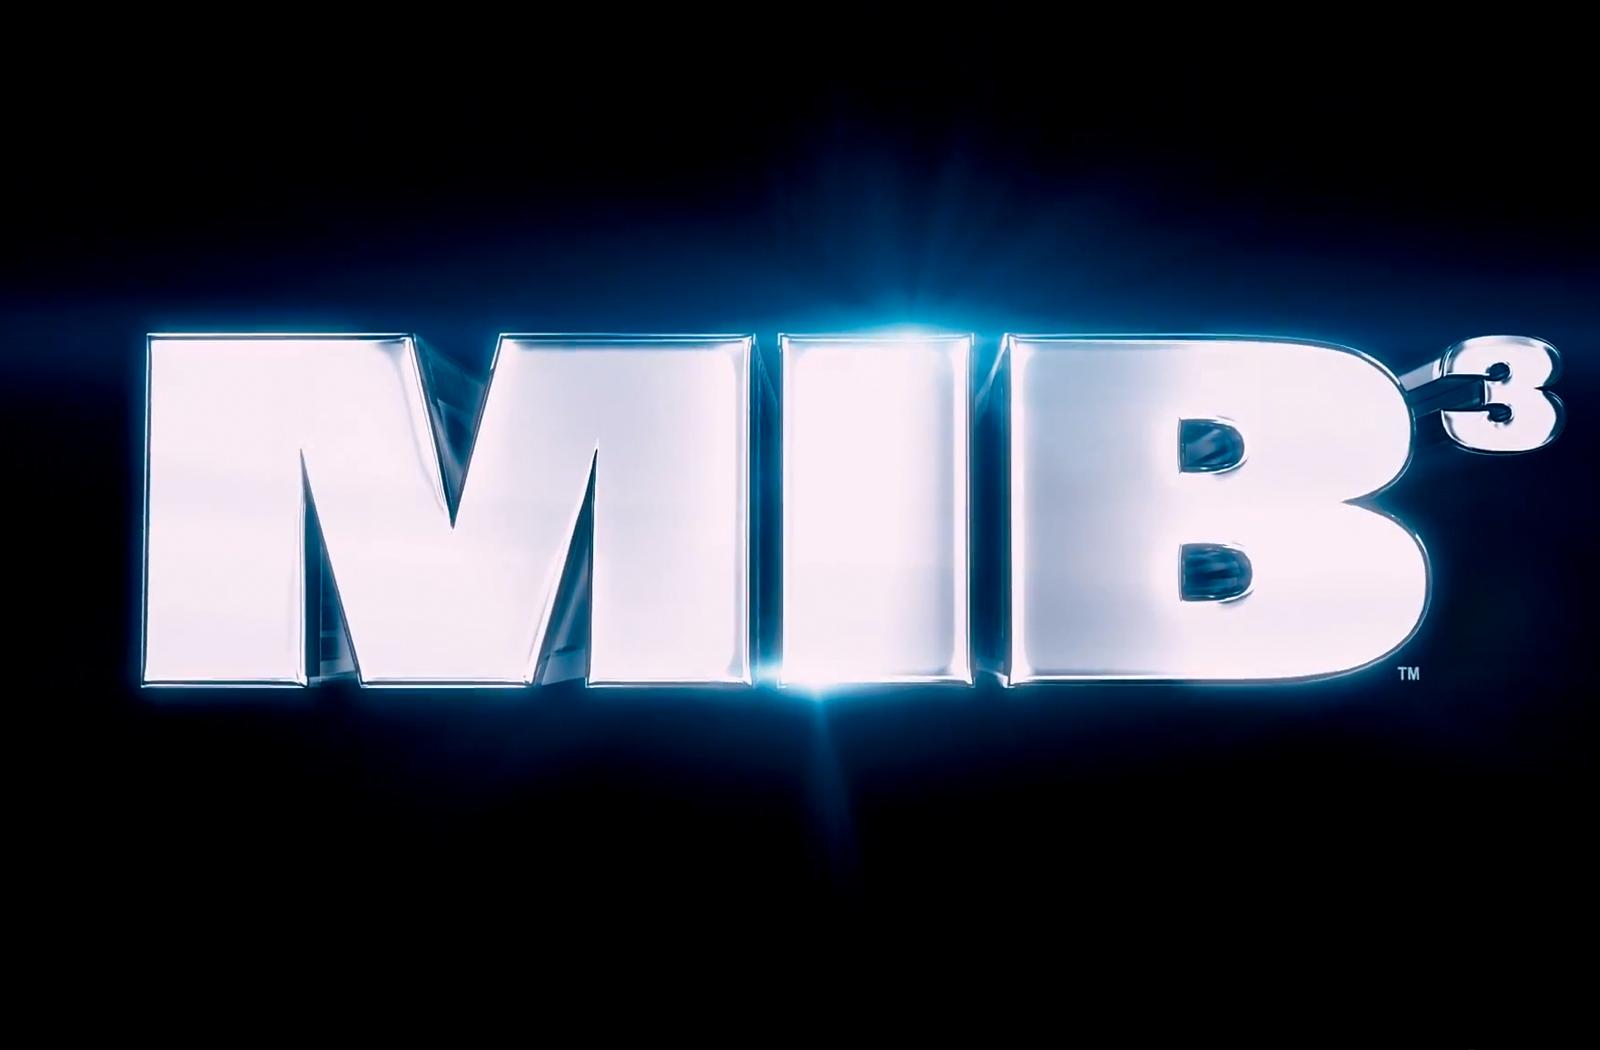 http://4.bp.blogspot.com/-rY5gJtGhyoQ/T4NSntucx1I/AAAAAAAABOw/N8ZEZAvhqKQ/s1600/Men_in_Black_3_MIB_3_3D_Logo.jpg